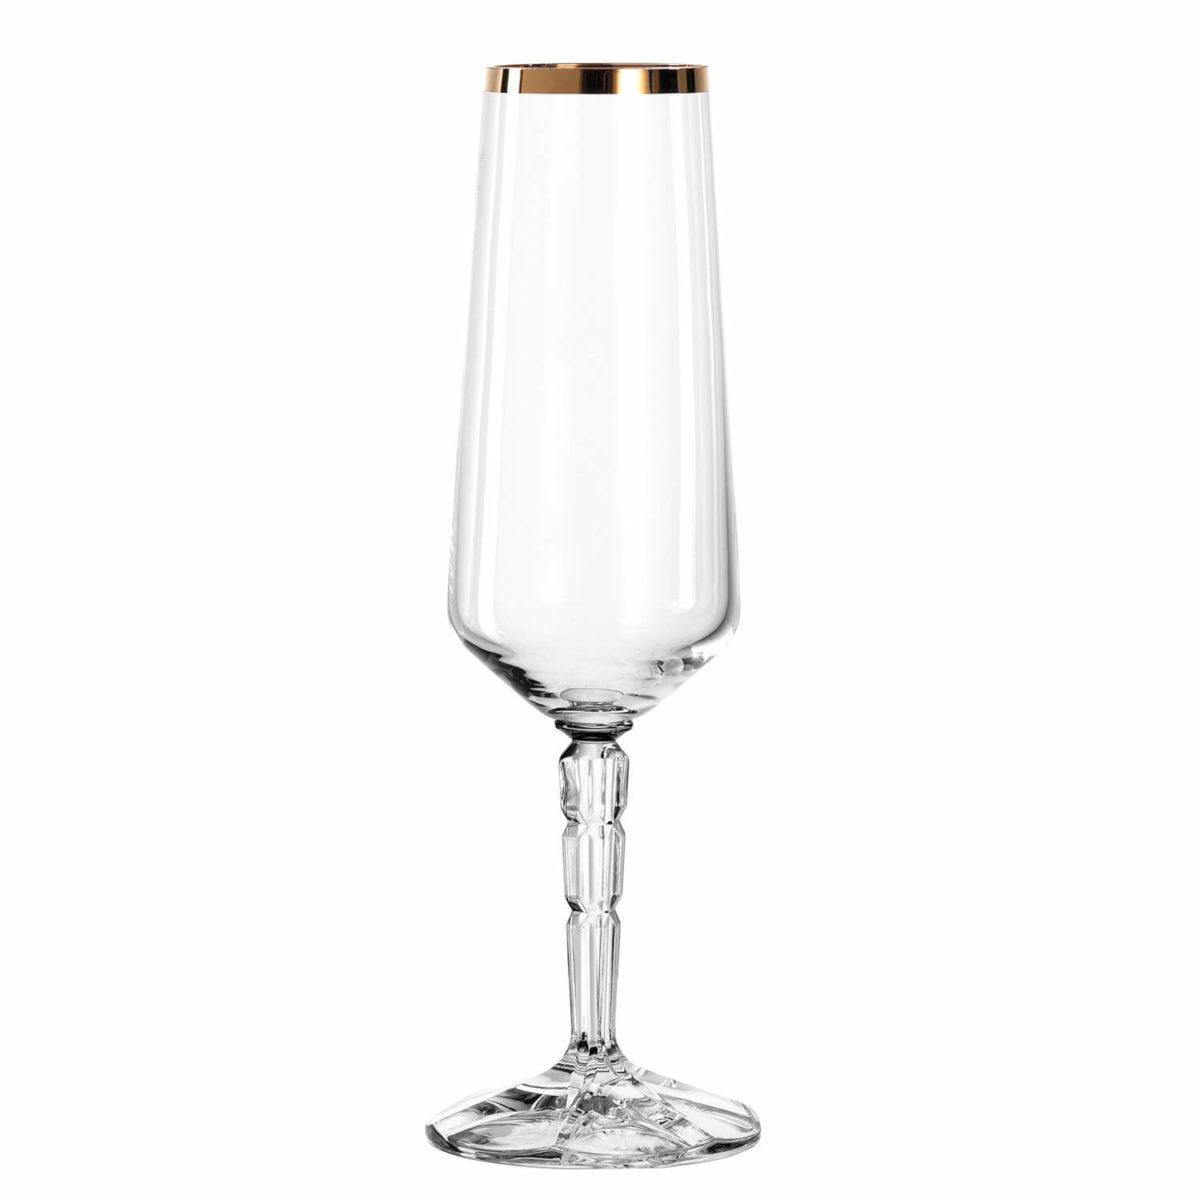 c4ca4238a0b923820dcc509a6f75849b 4 1200x1200 - Pahar pentru șampanie Spiritii gold (L022701)